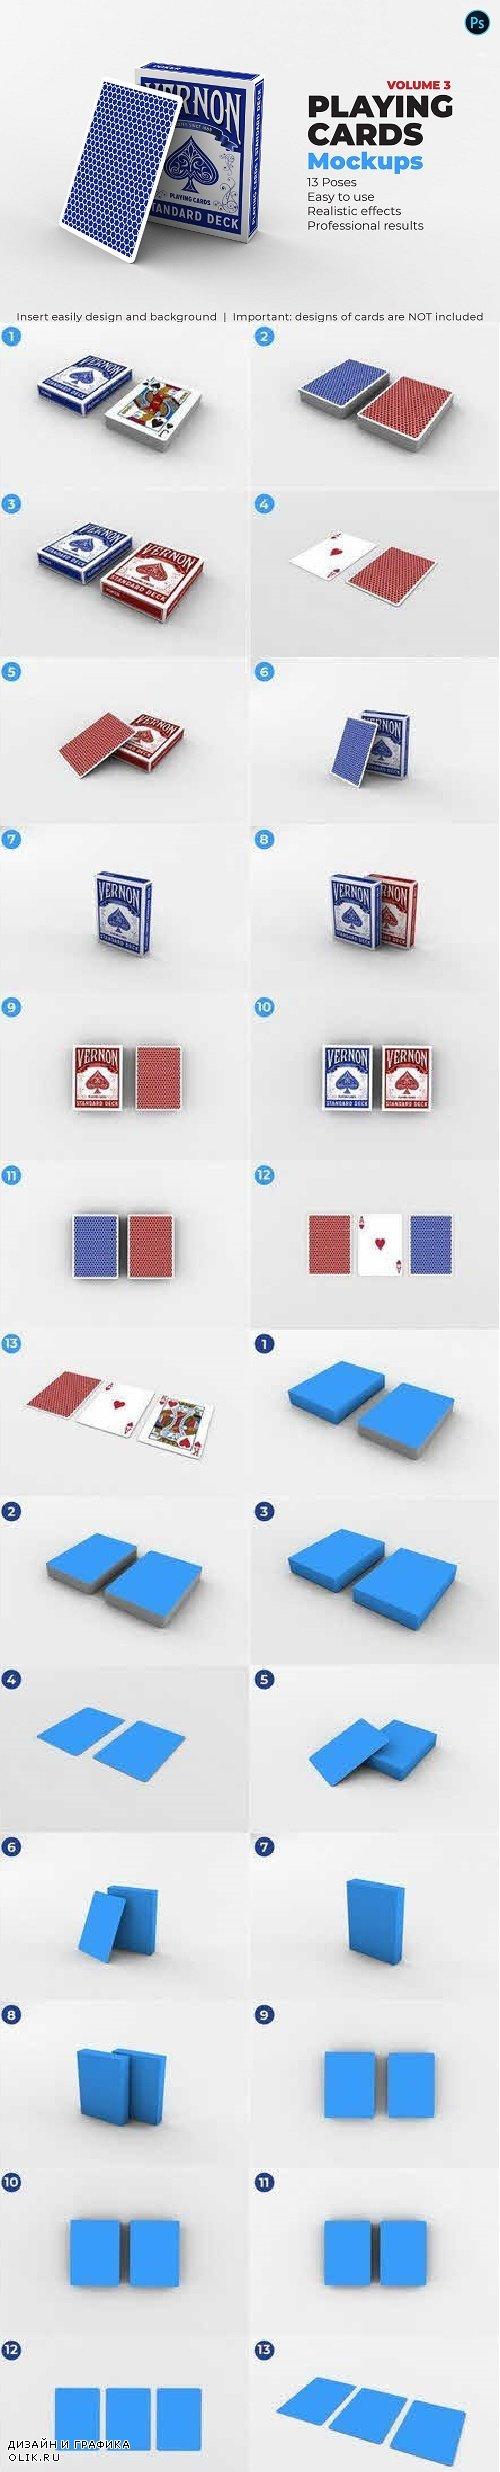 Playing Cards Mock-up V.3 - 3370704